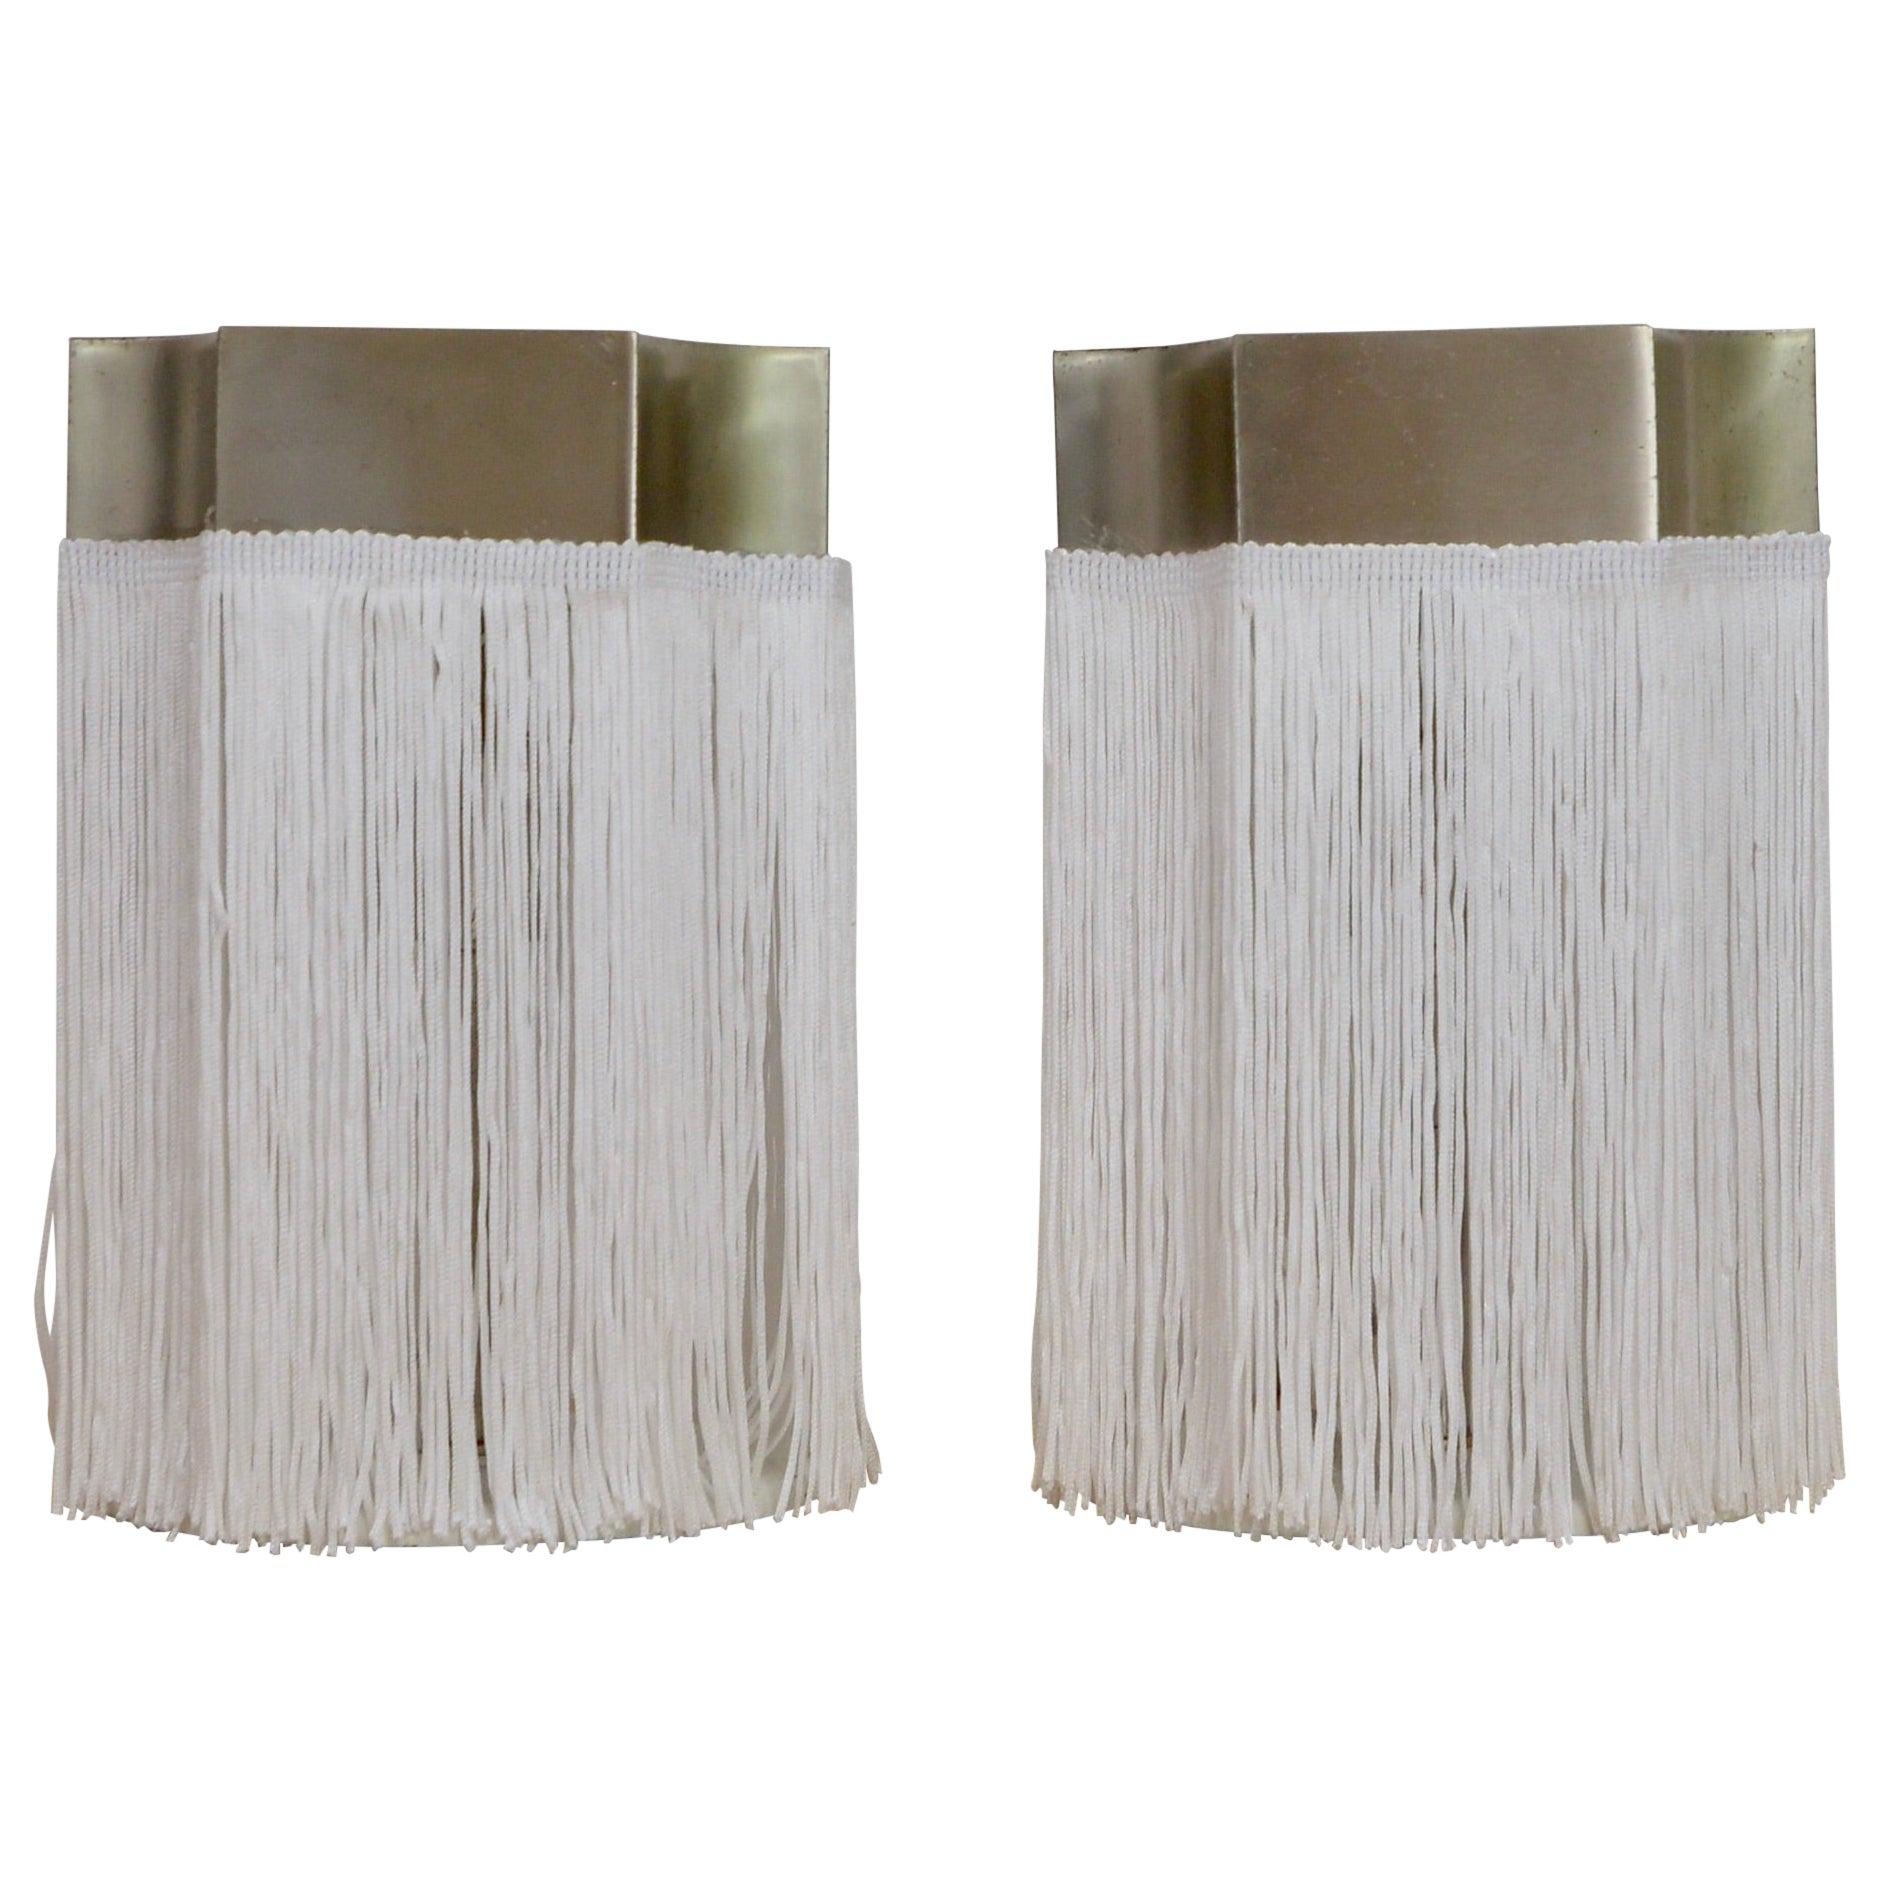 Gianfranco Frattini Table Lamps